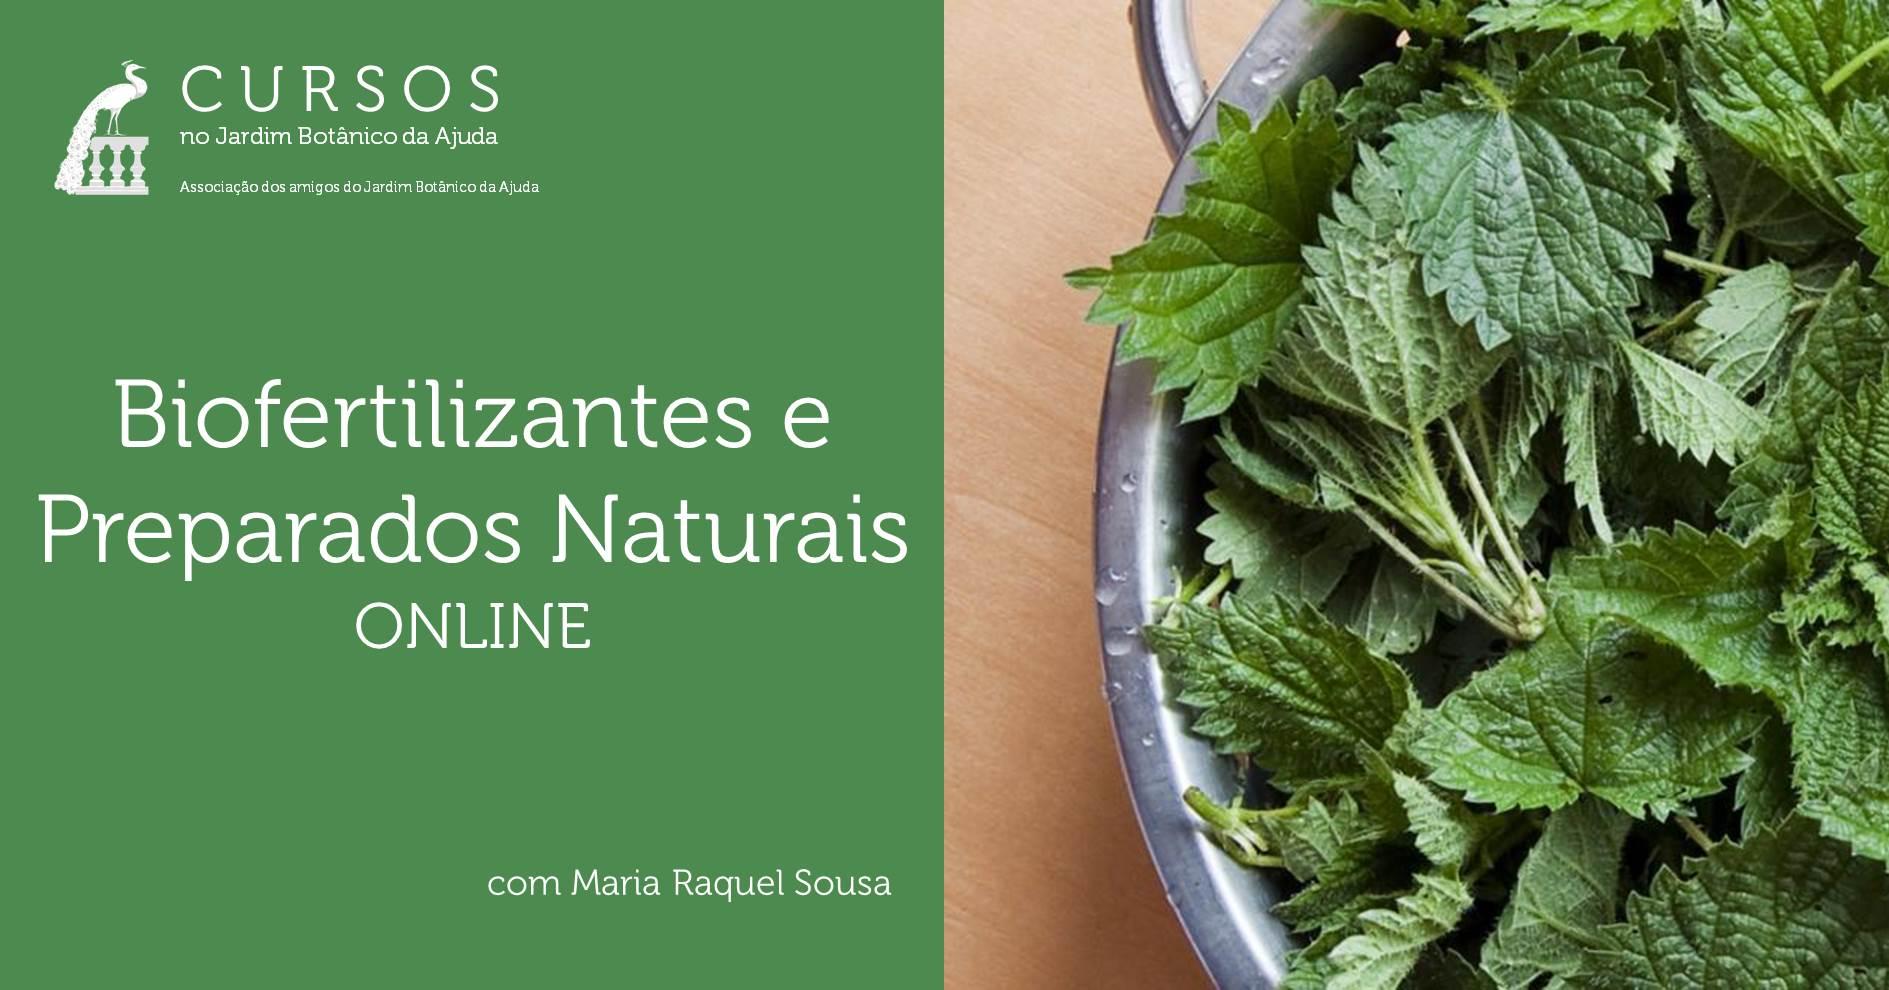 Biofertilizantes e Preparados Naturais | Curso Online